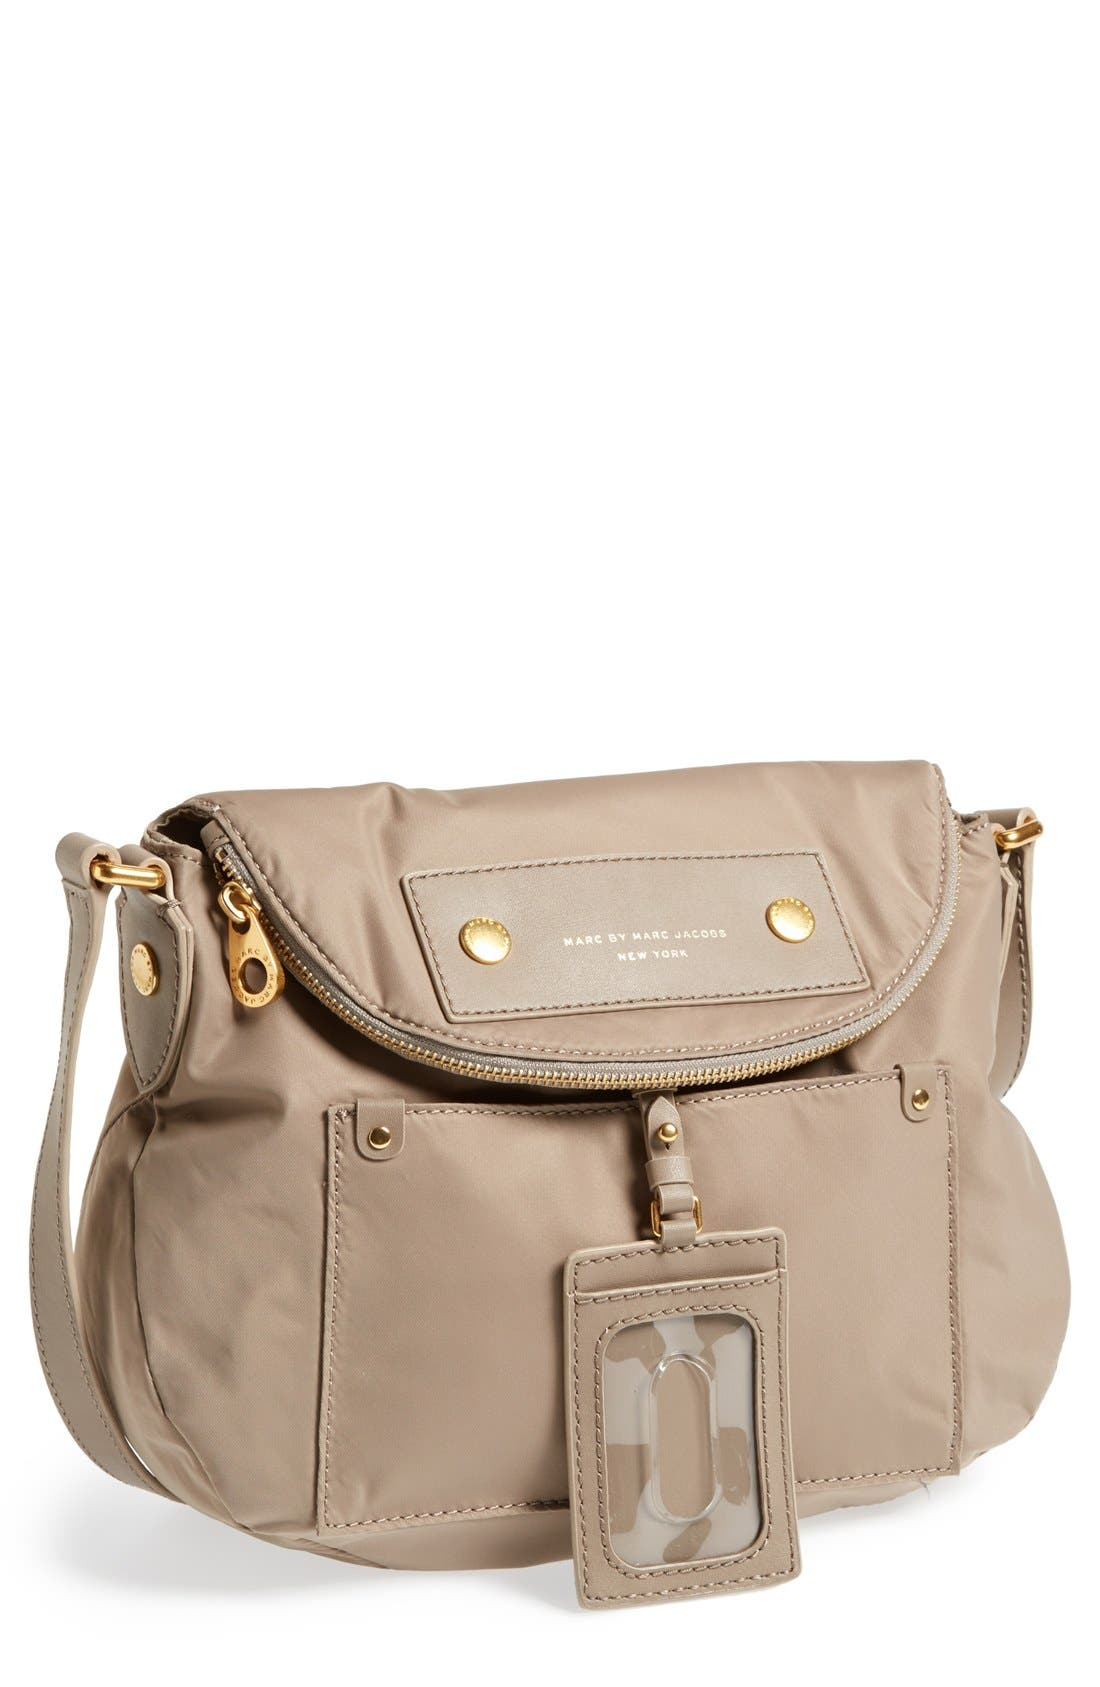 Main Image - MARC BY MARC JACOBS ' Preppy Nylon - Natasha' Crossbody Bag